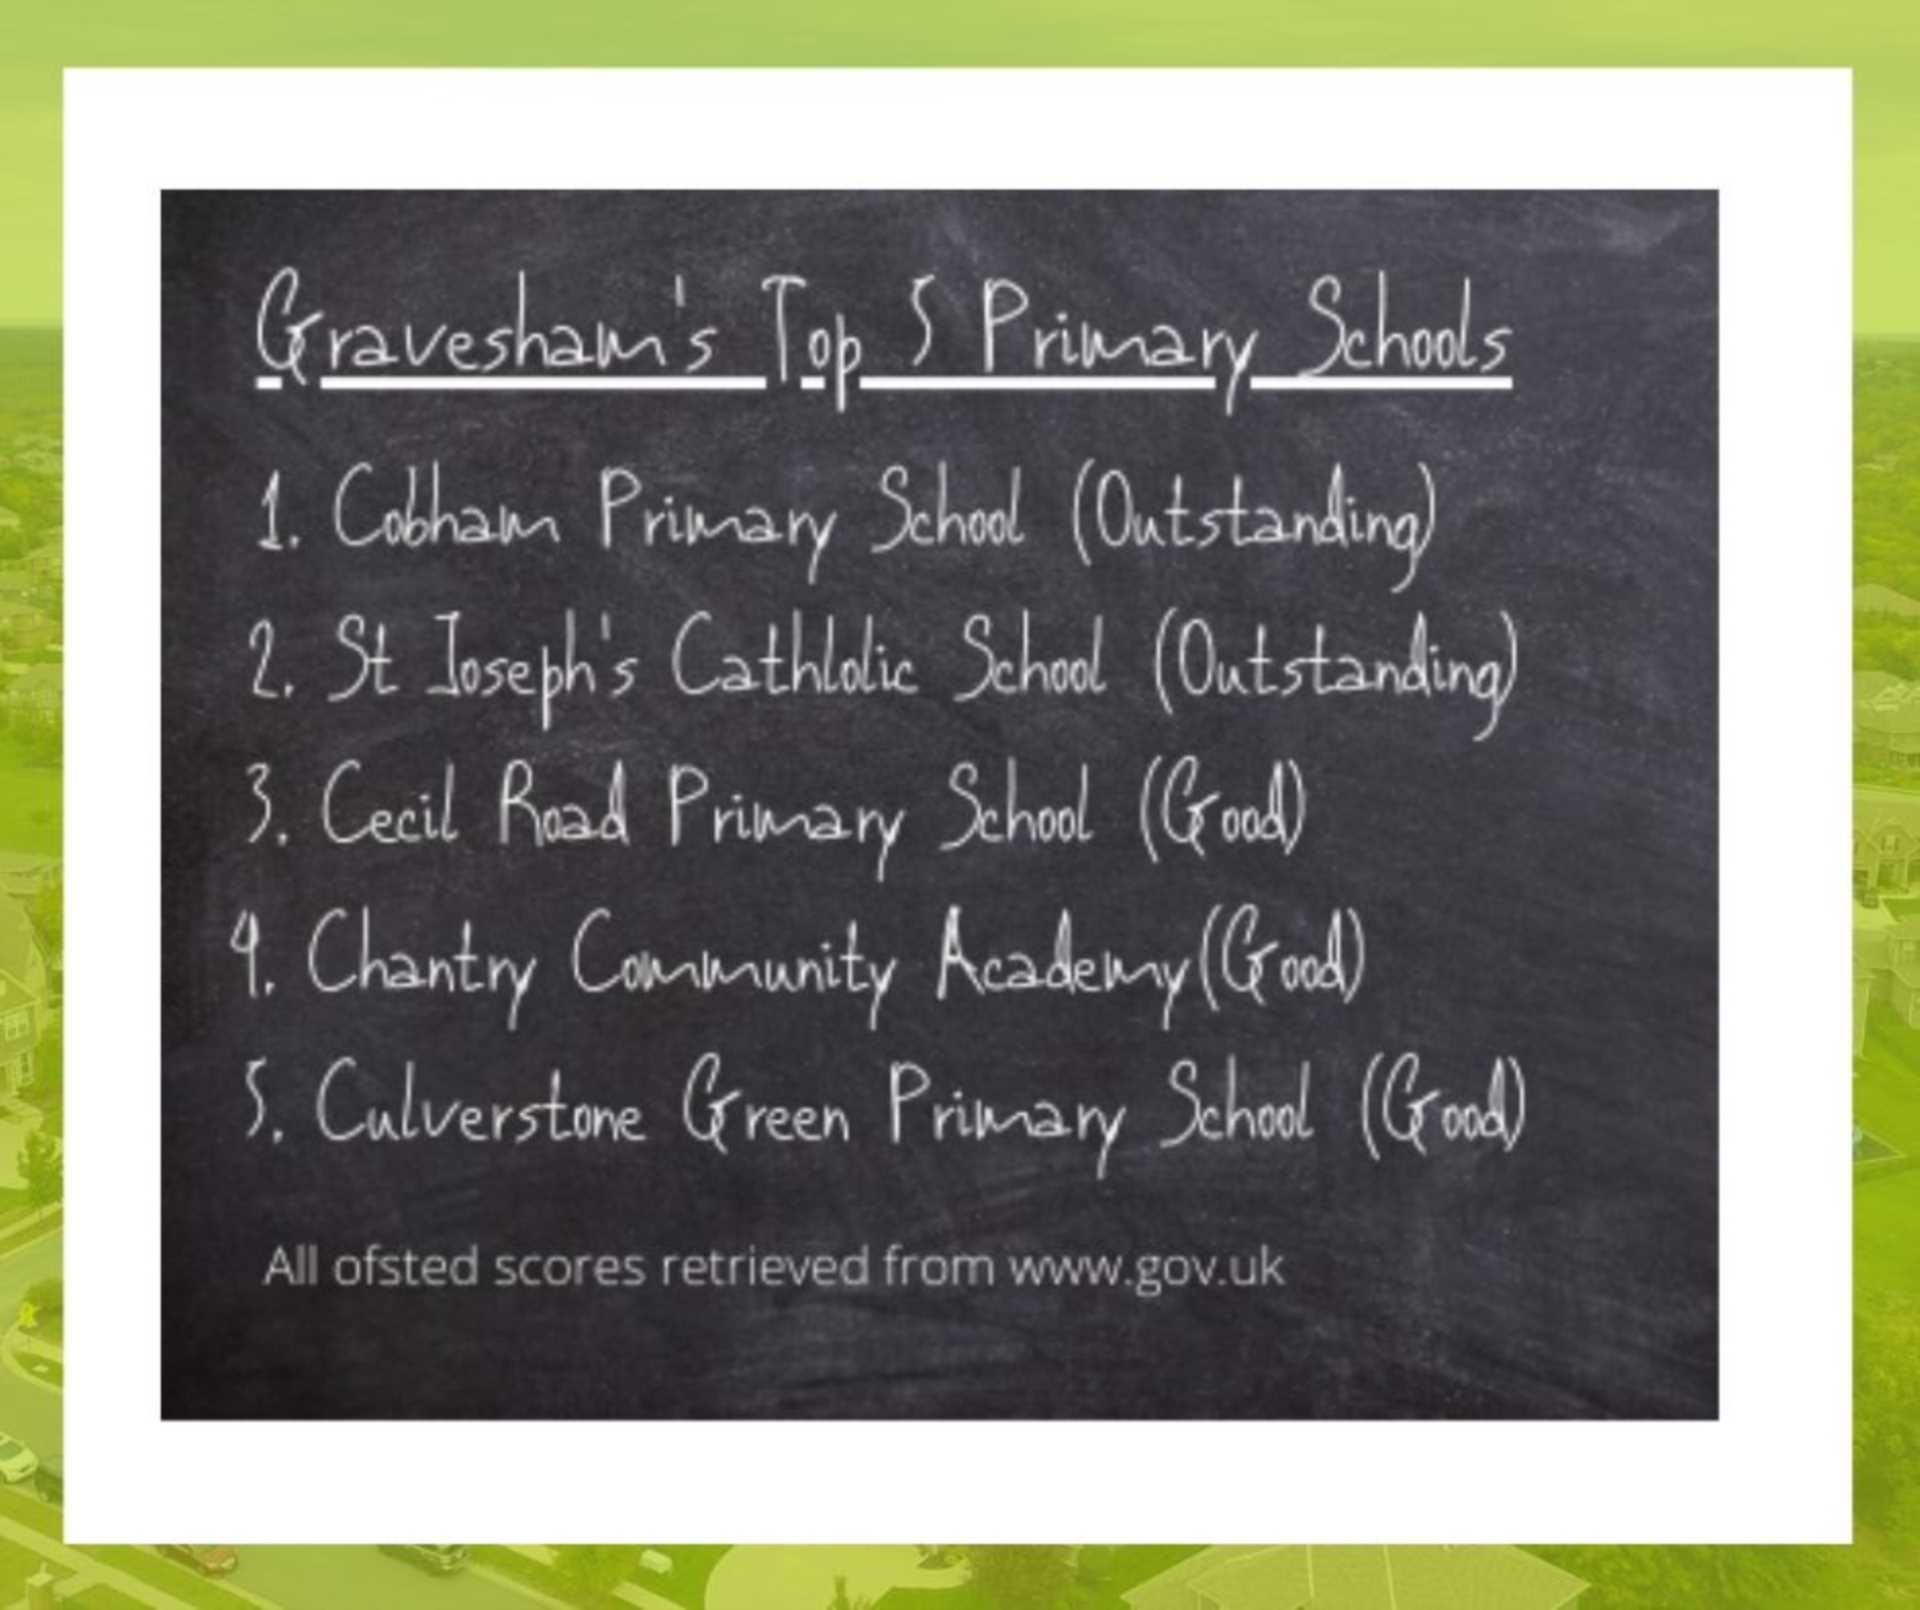 Top 5 Primary School In Gravesham